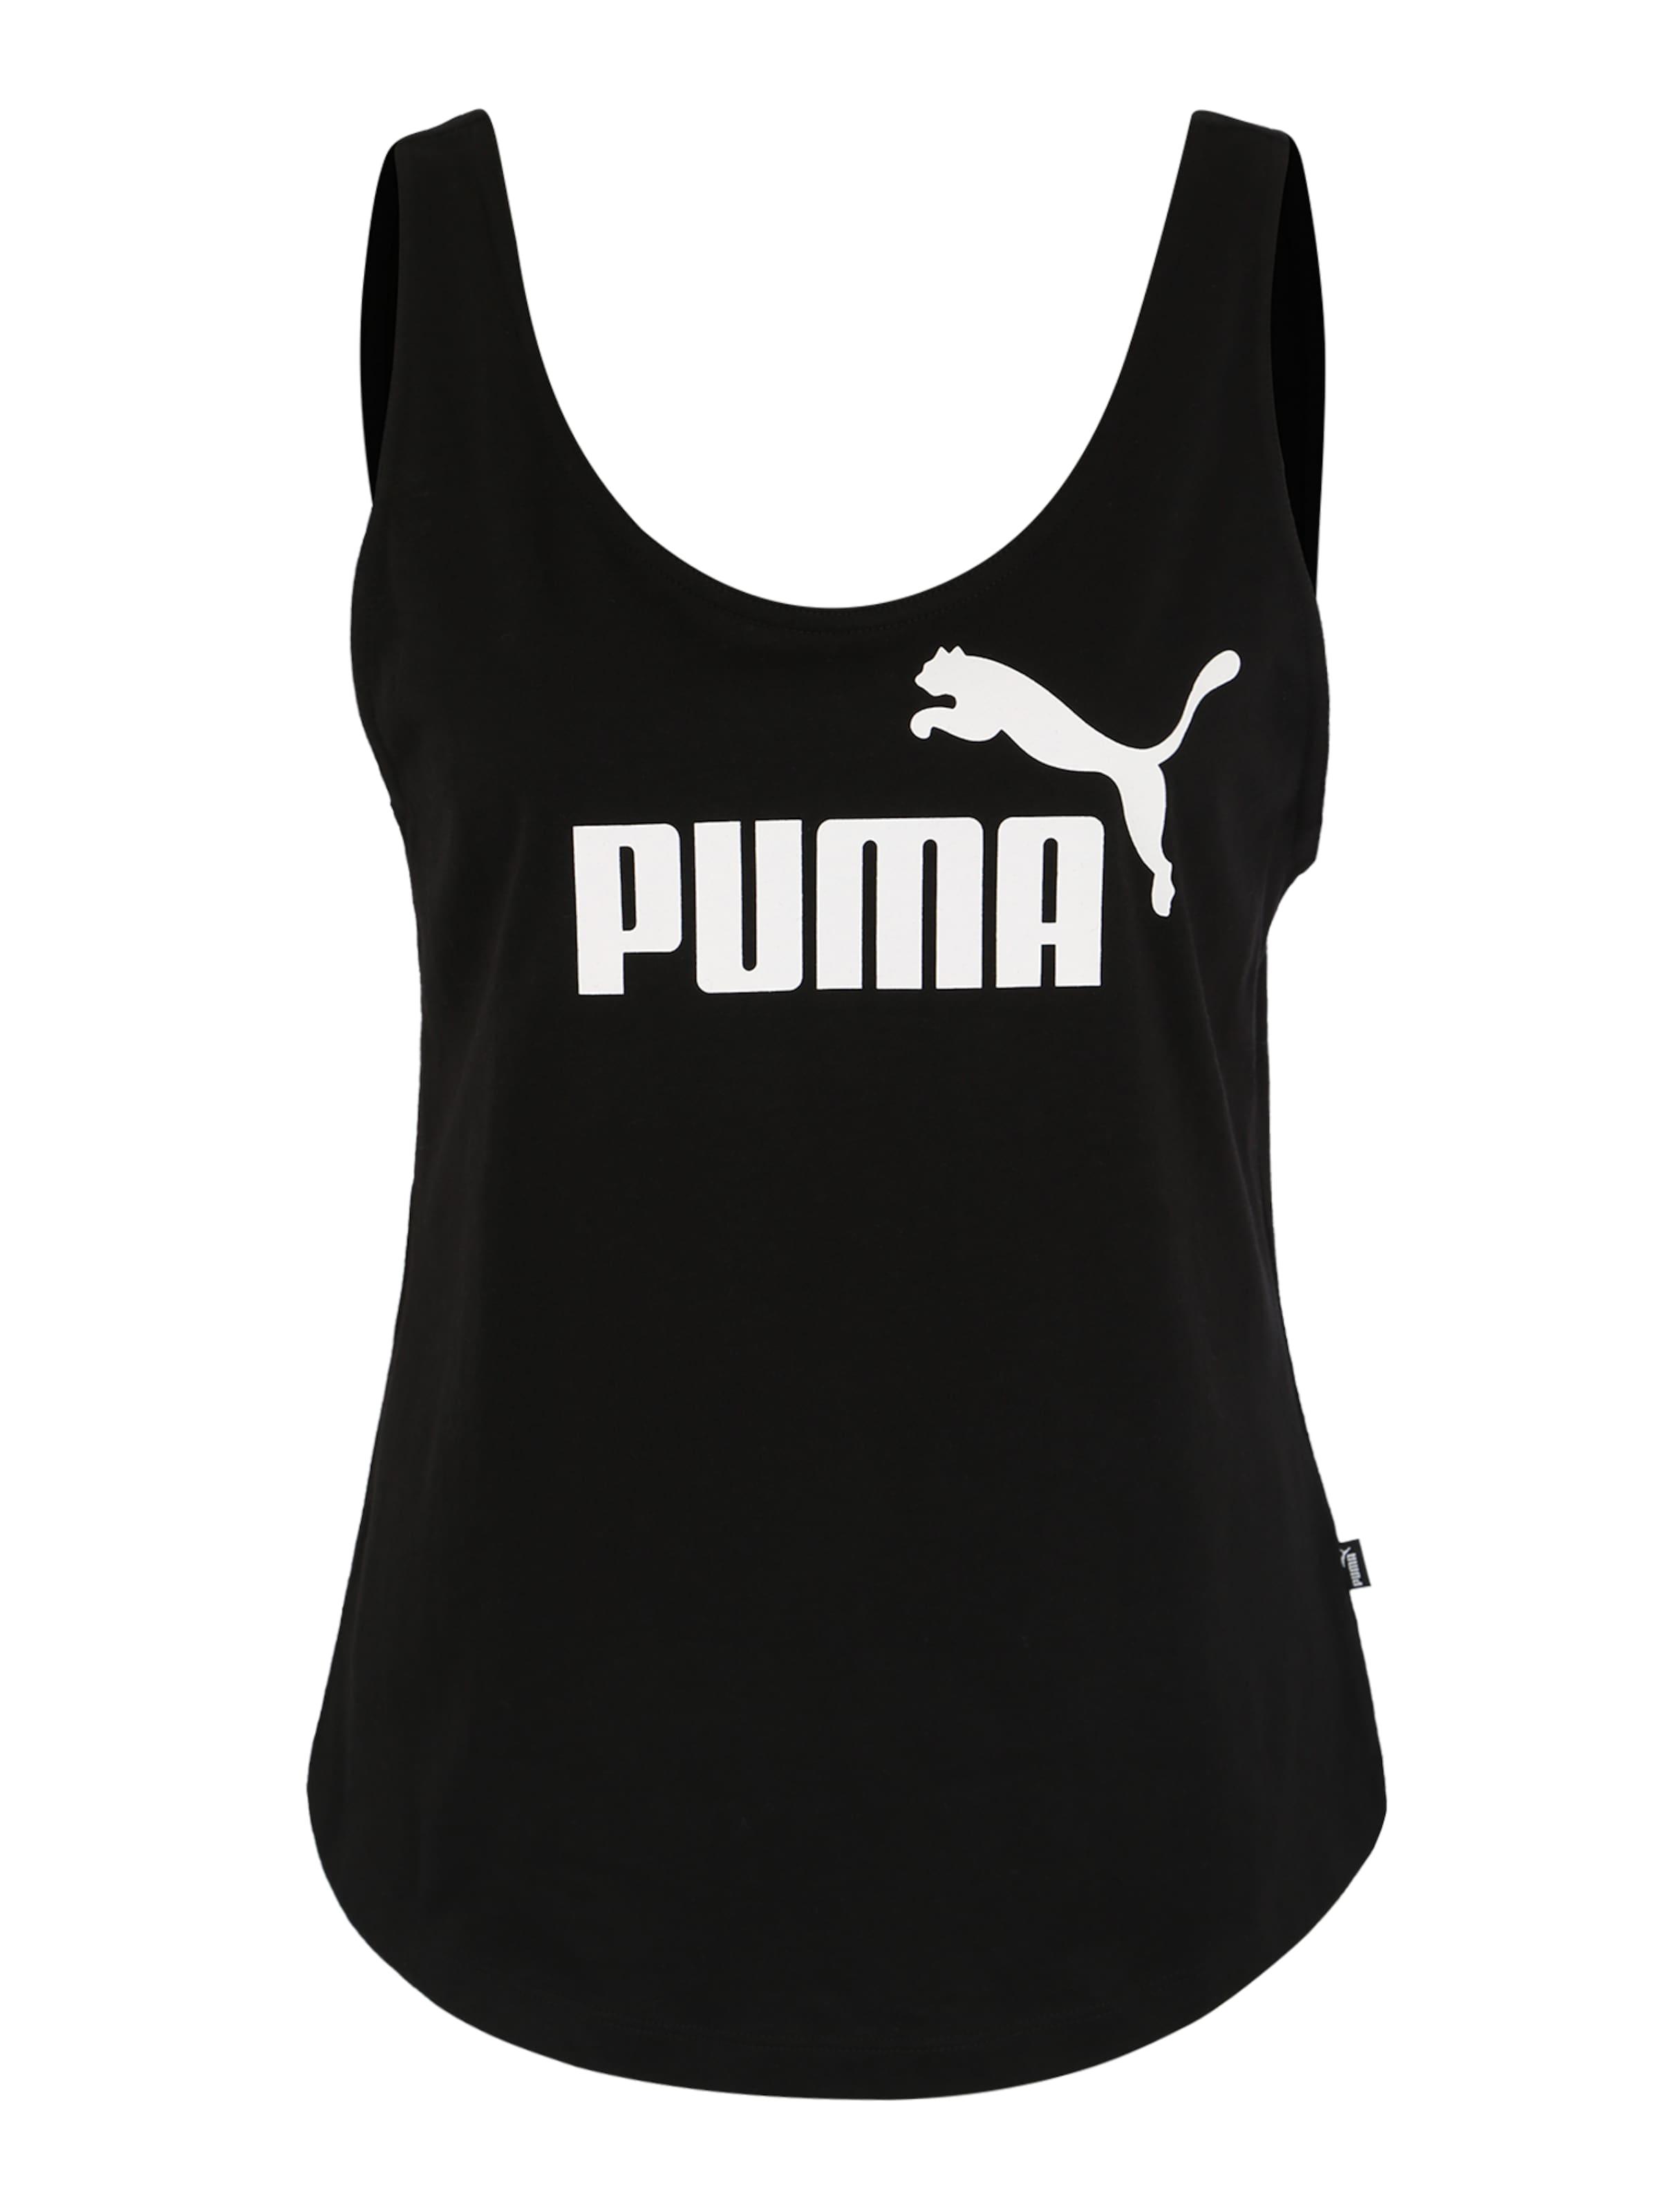 Sporttop In Puma Puma ZwartWit Puma Sporttop In ZwartWit 80wOvnyNPm